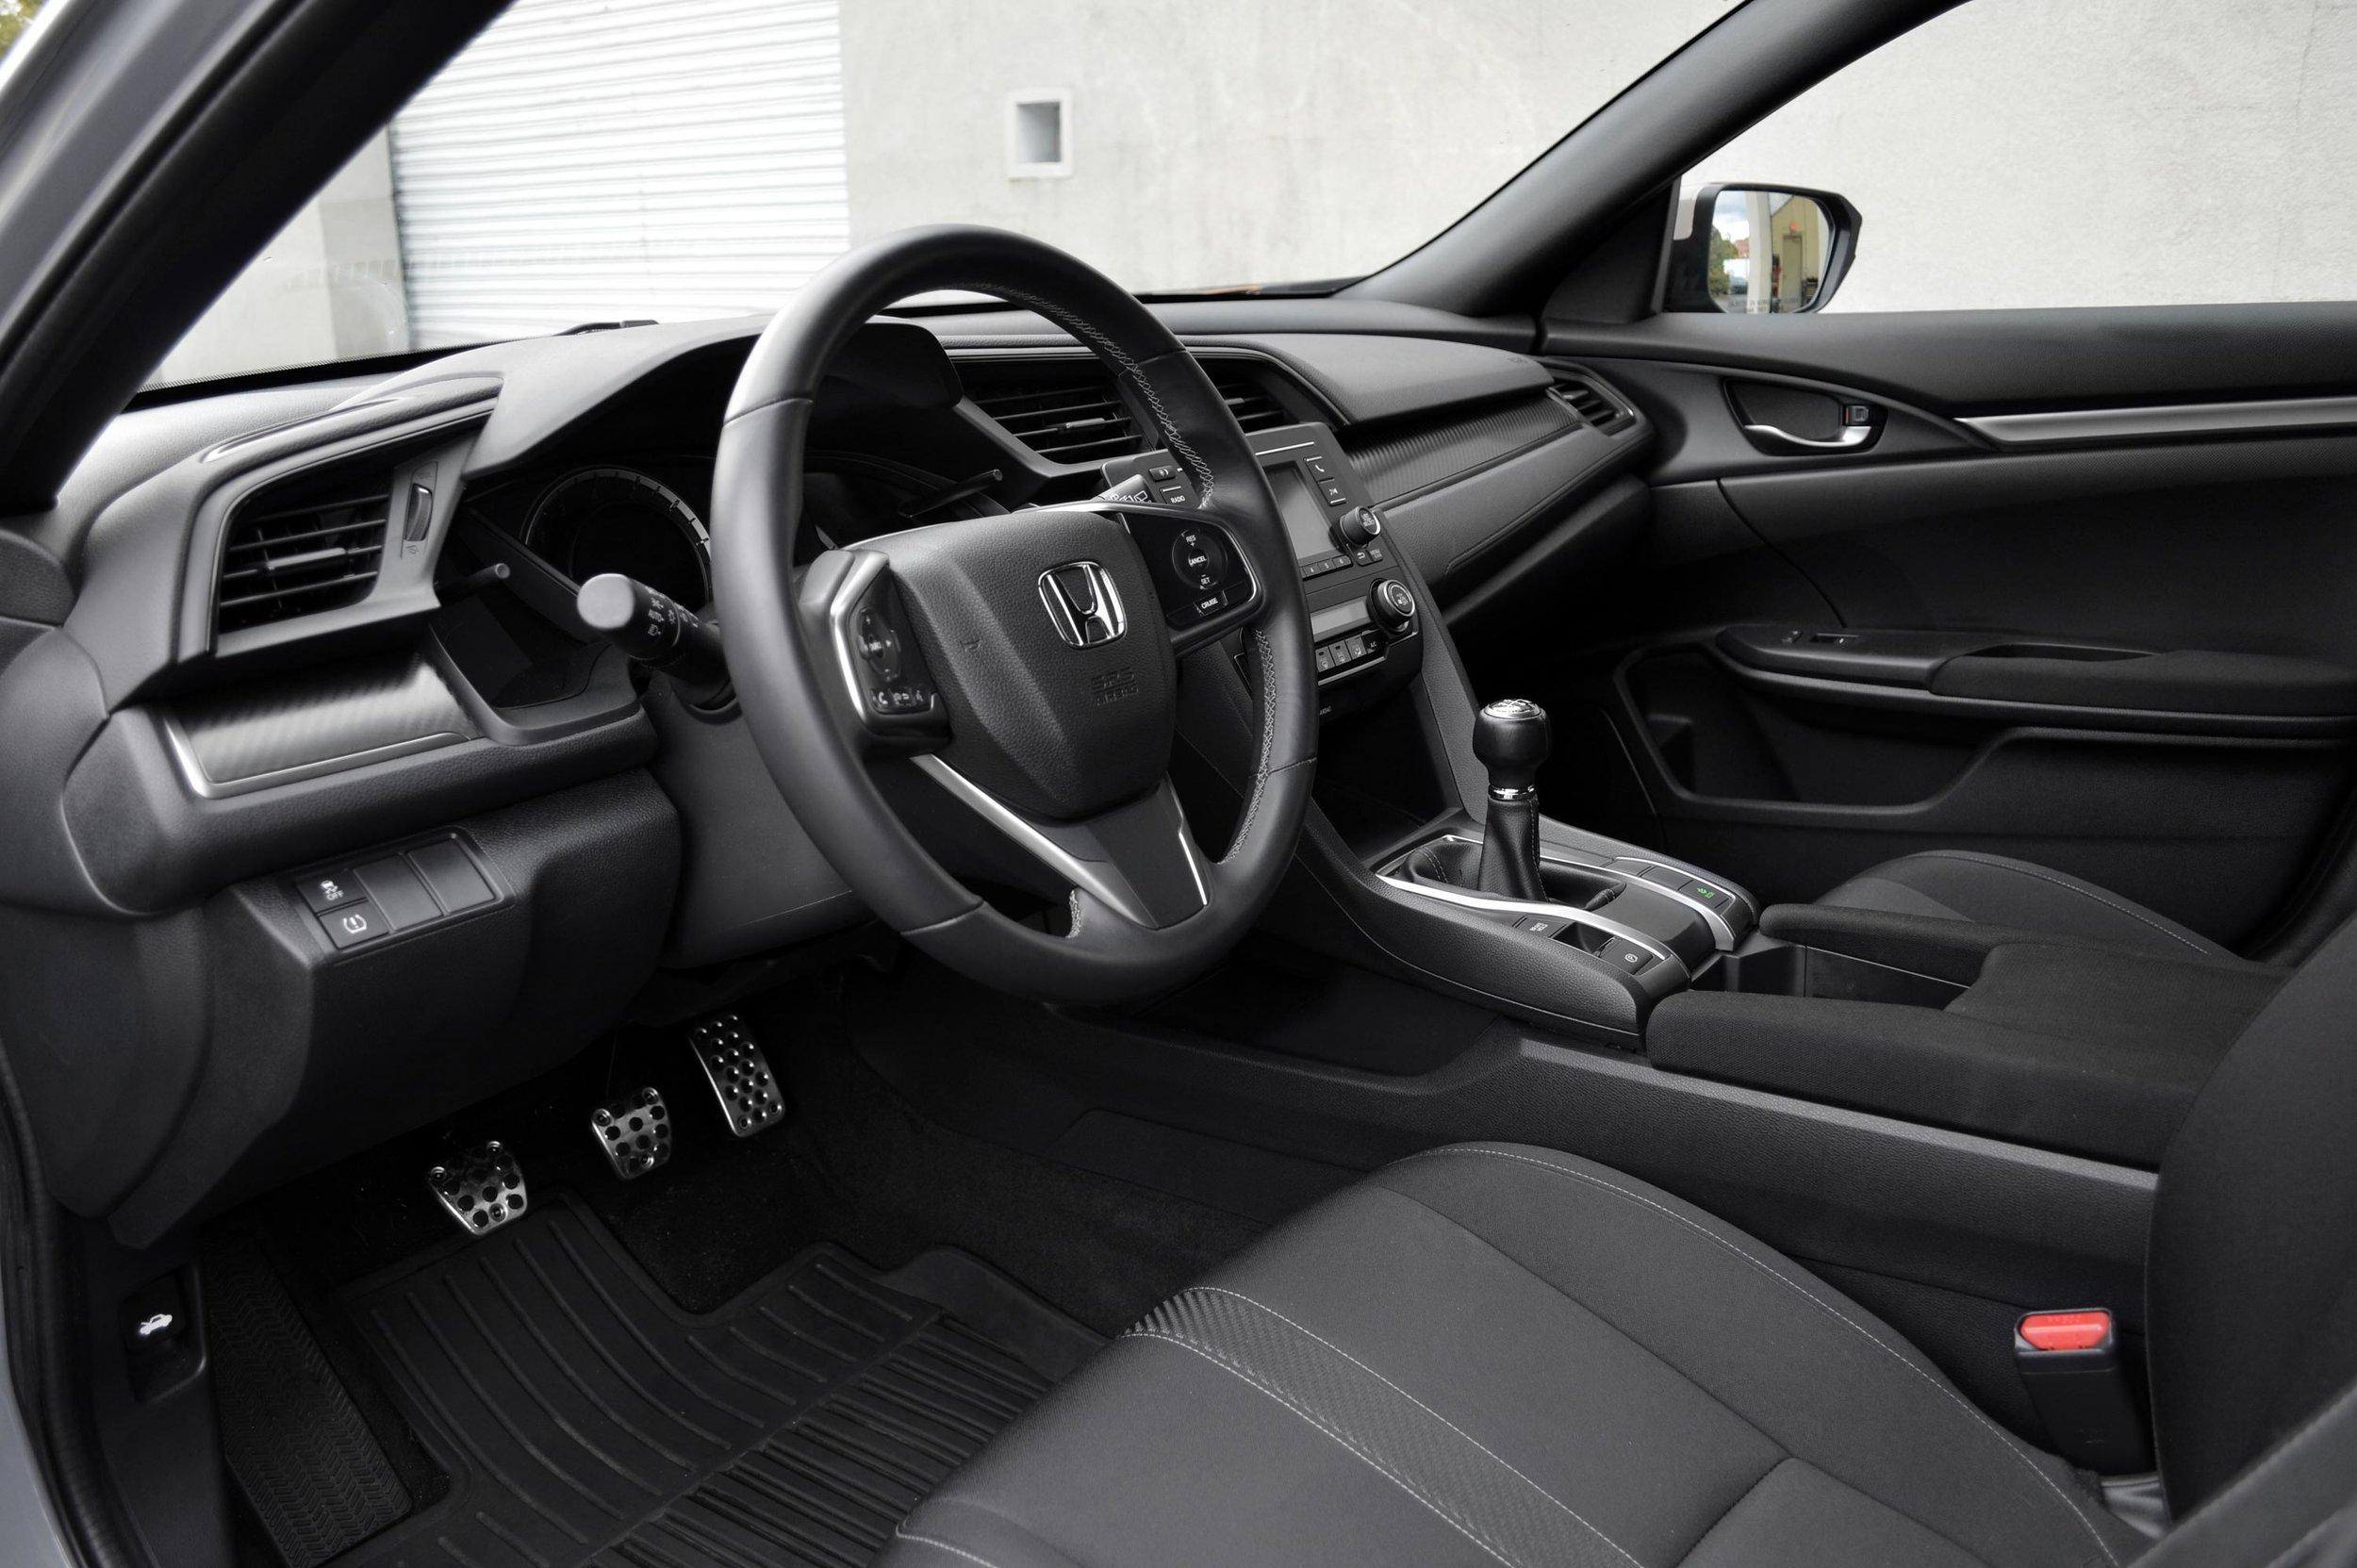 2017-Honda-HSB-Interior-web.jpg